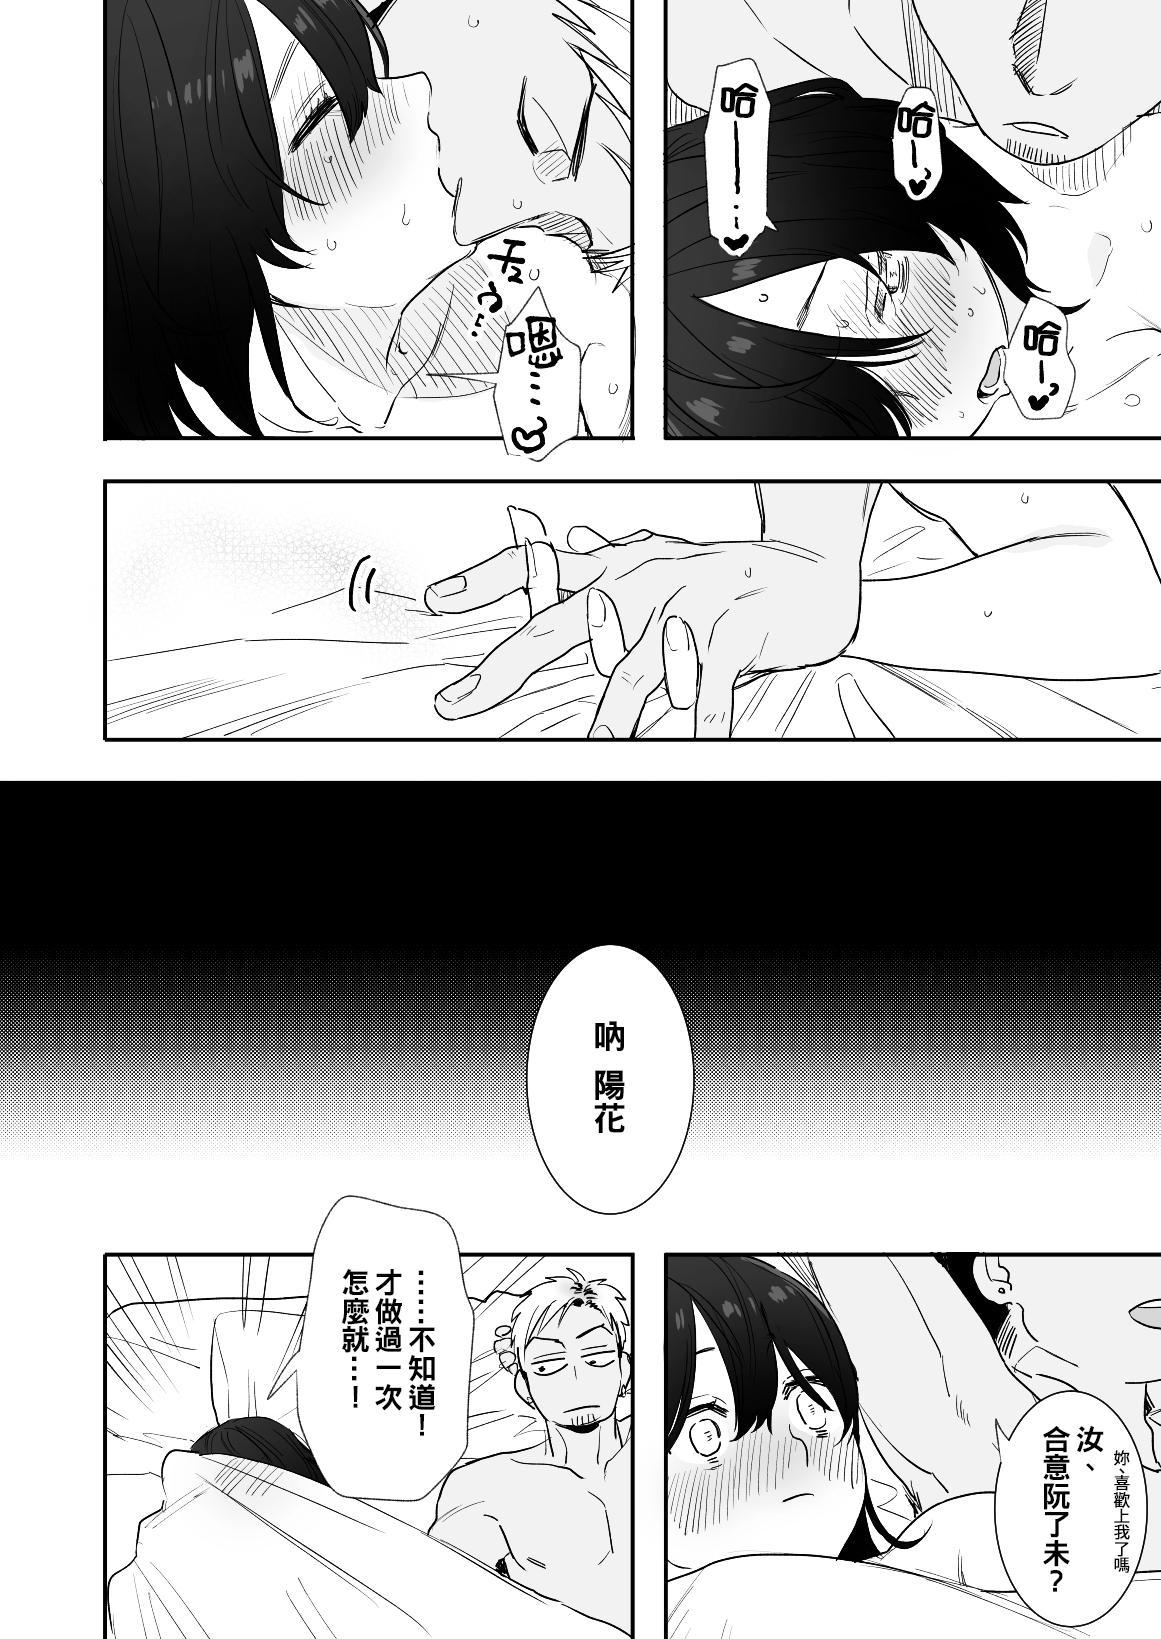 〇sen Yen de Oppai Misete. 39